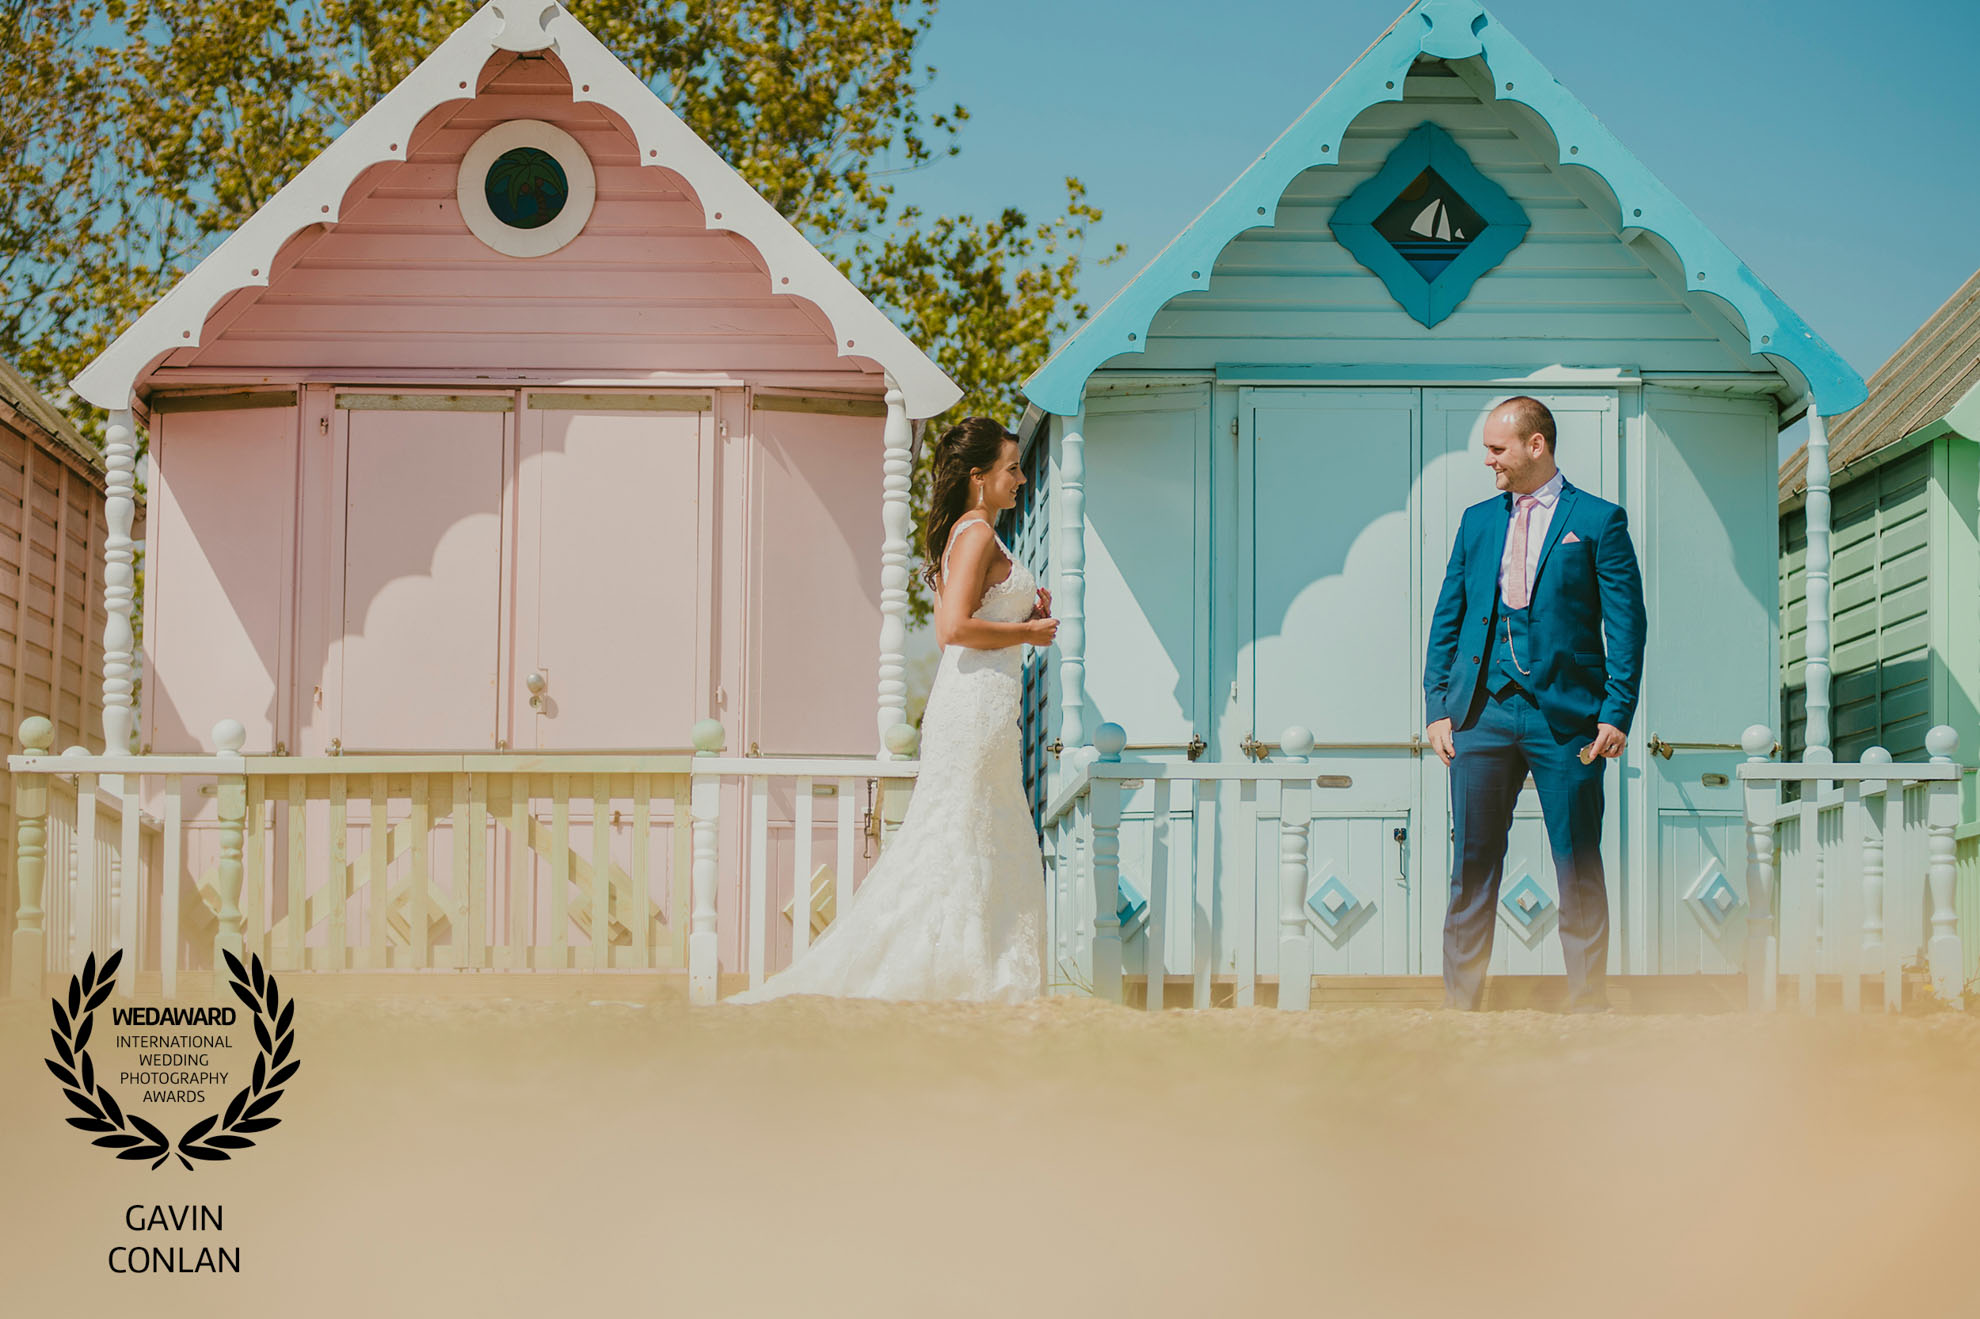 beach-wedding-mersea-island-gavin-conlan-photography